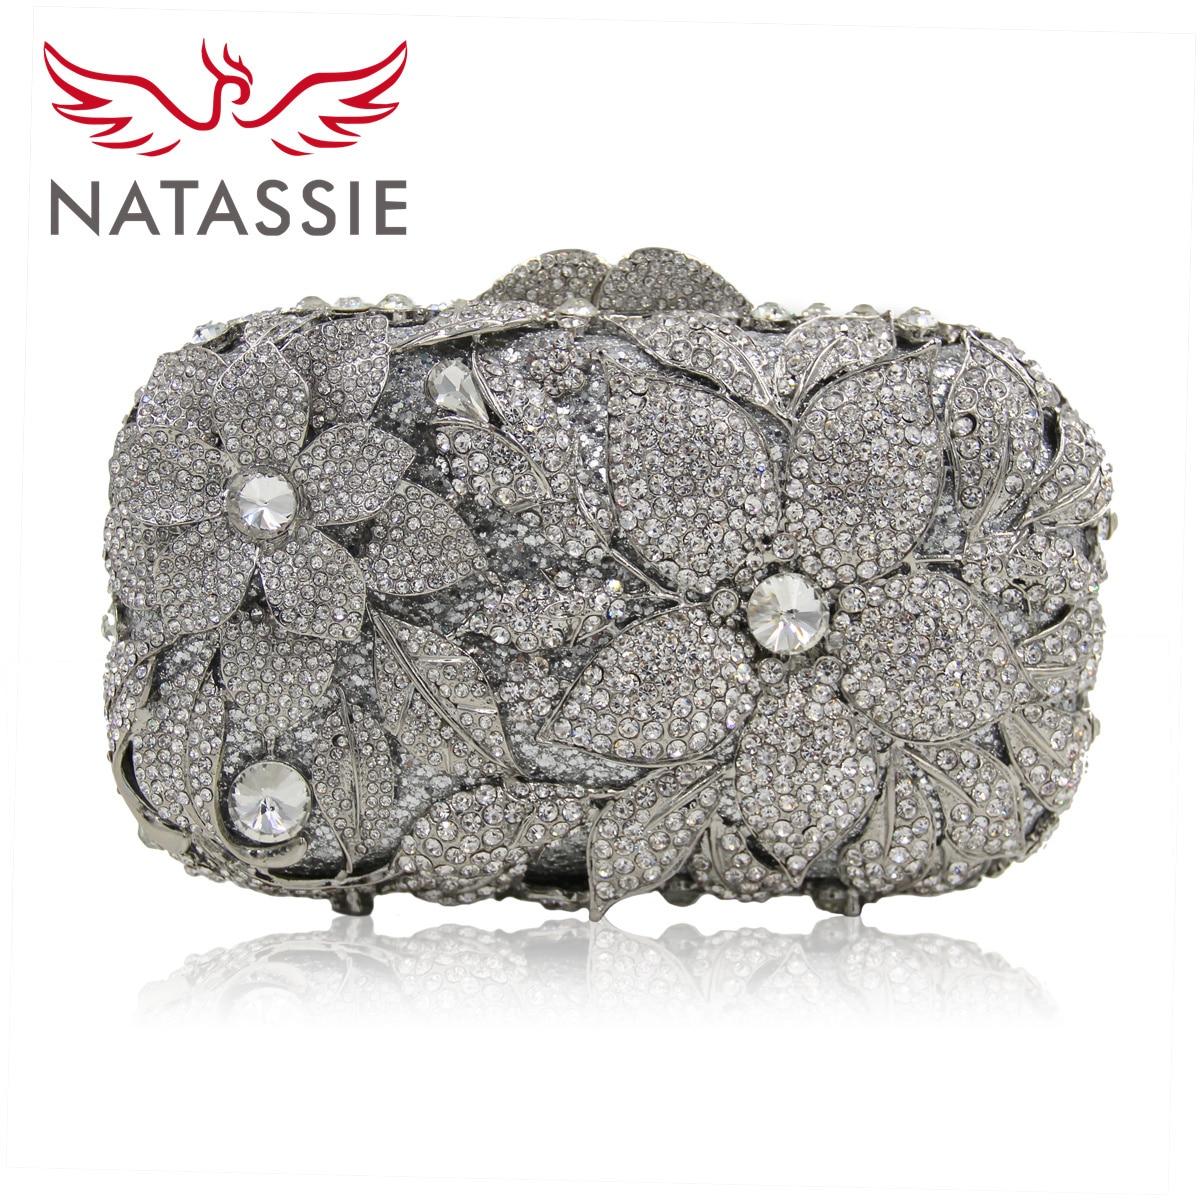 Natassie bolsa de noche de las mujeres de plata de la moda flor de cristal hembr